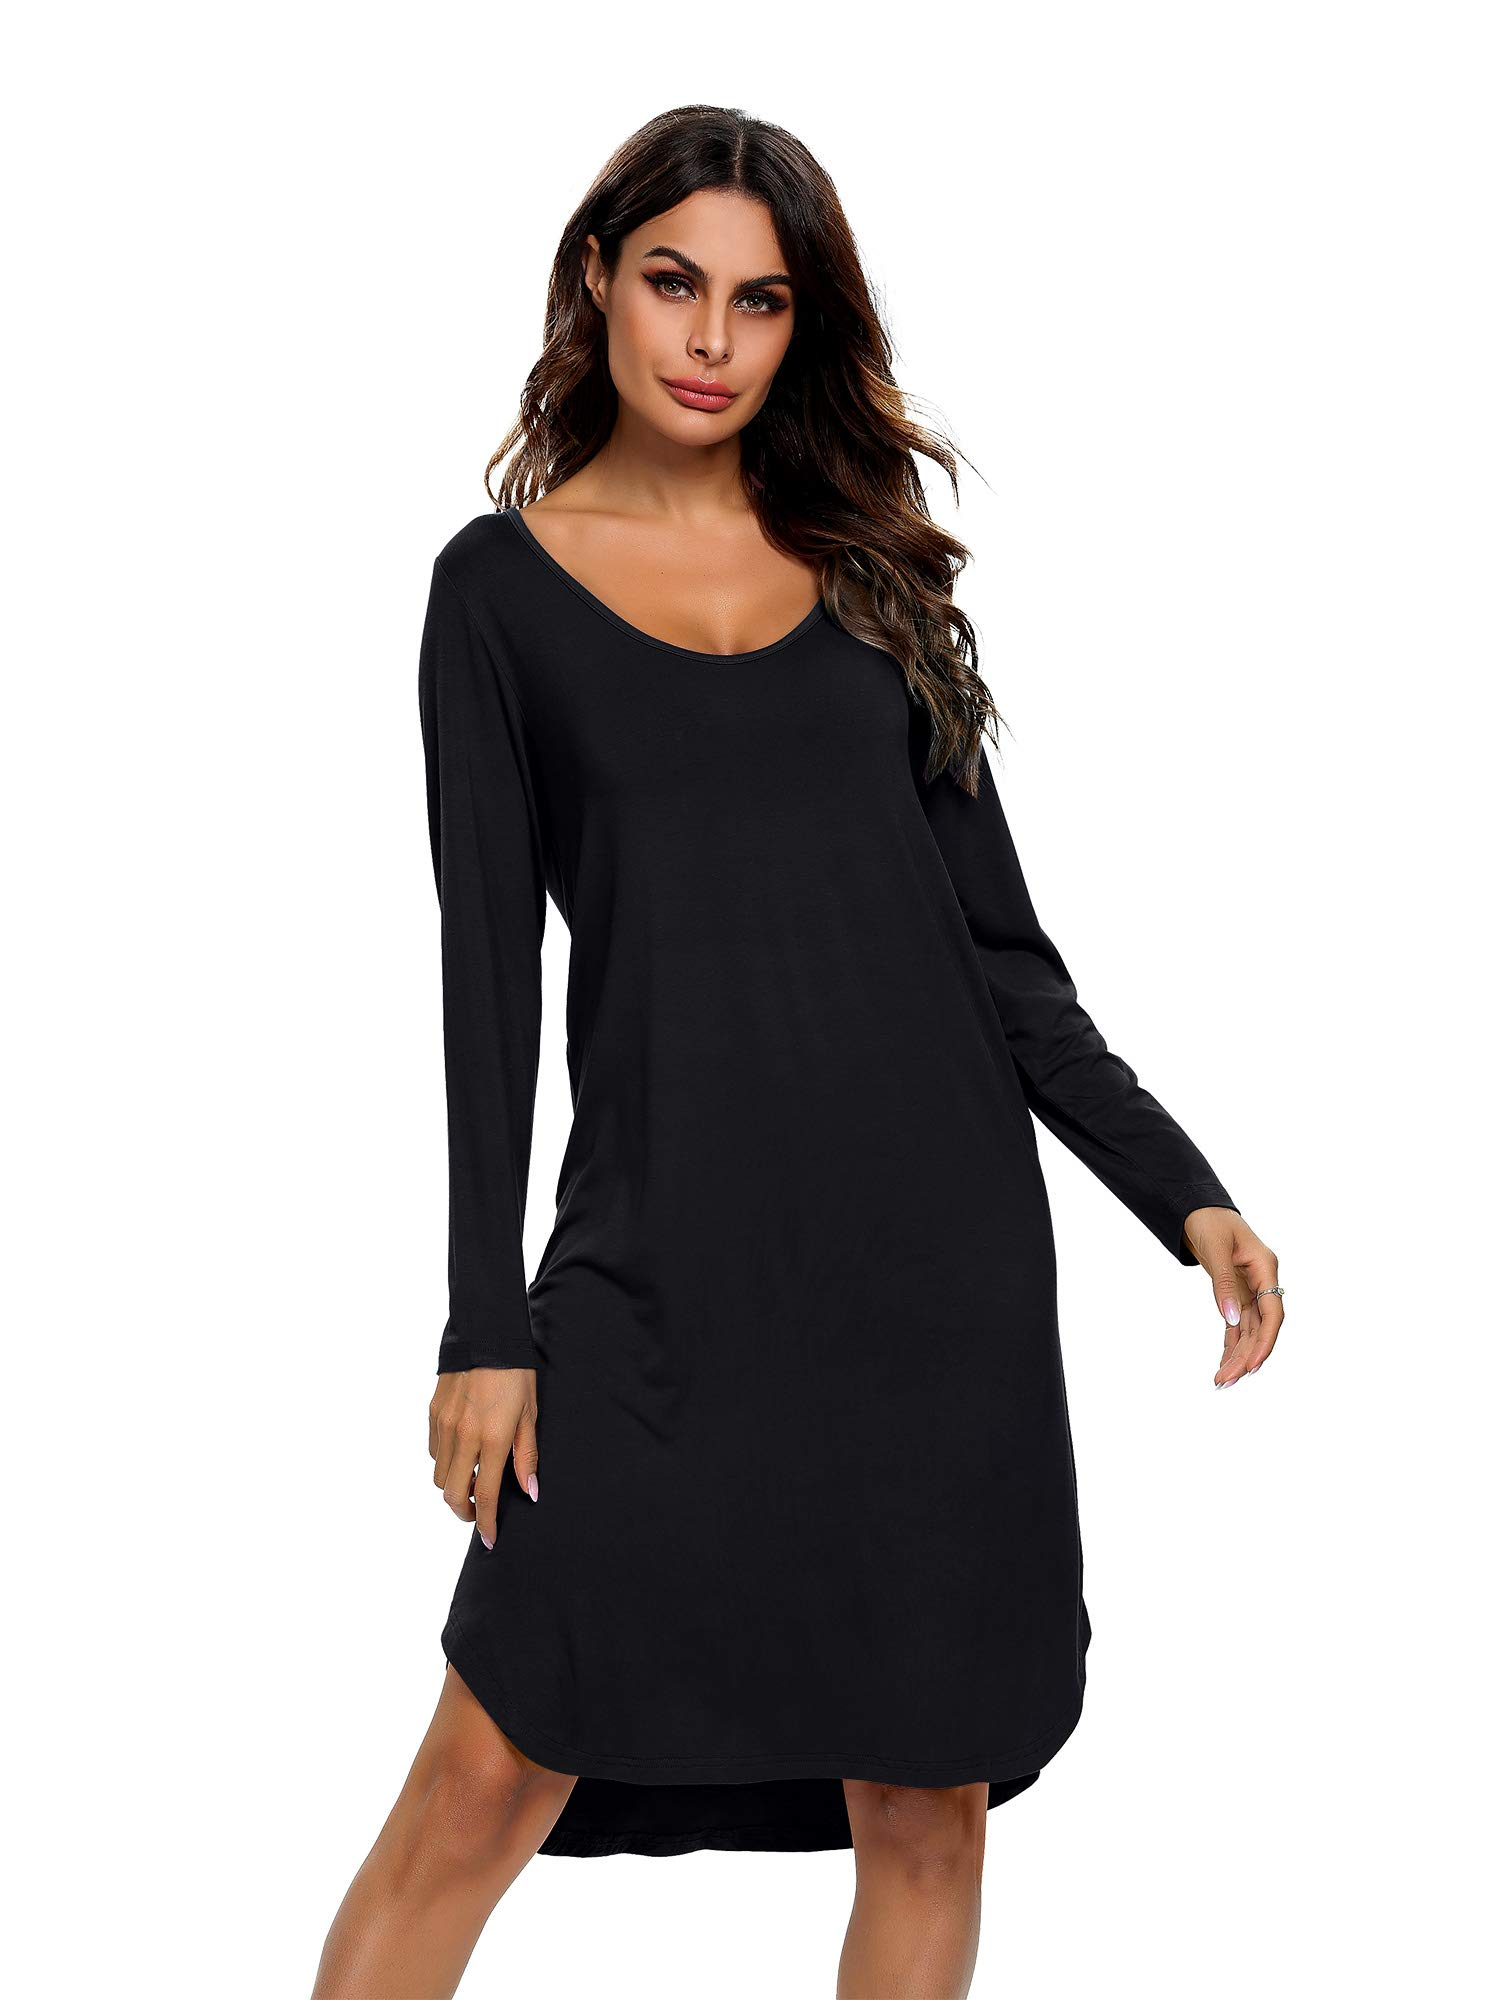 TIKTIK Long Sleeve Winter Nightgowns for Women Soft Long Sleep Shirts Sleepwear Plus Size S-4XL